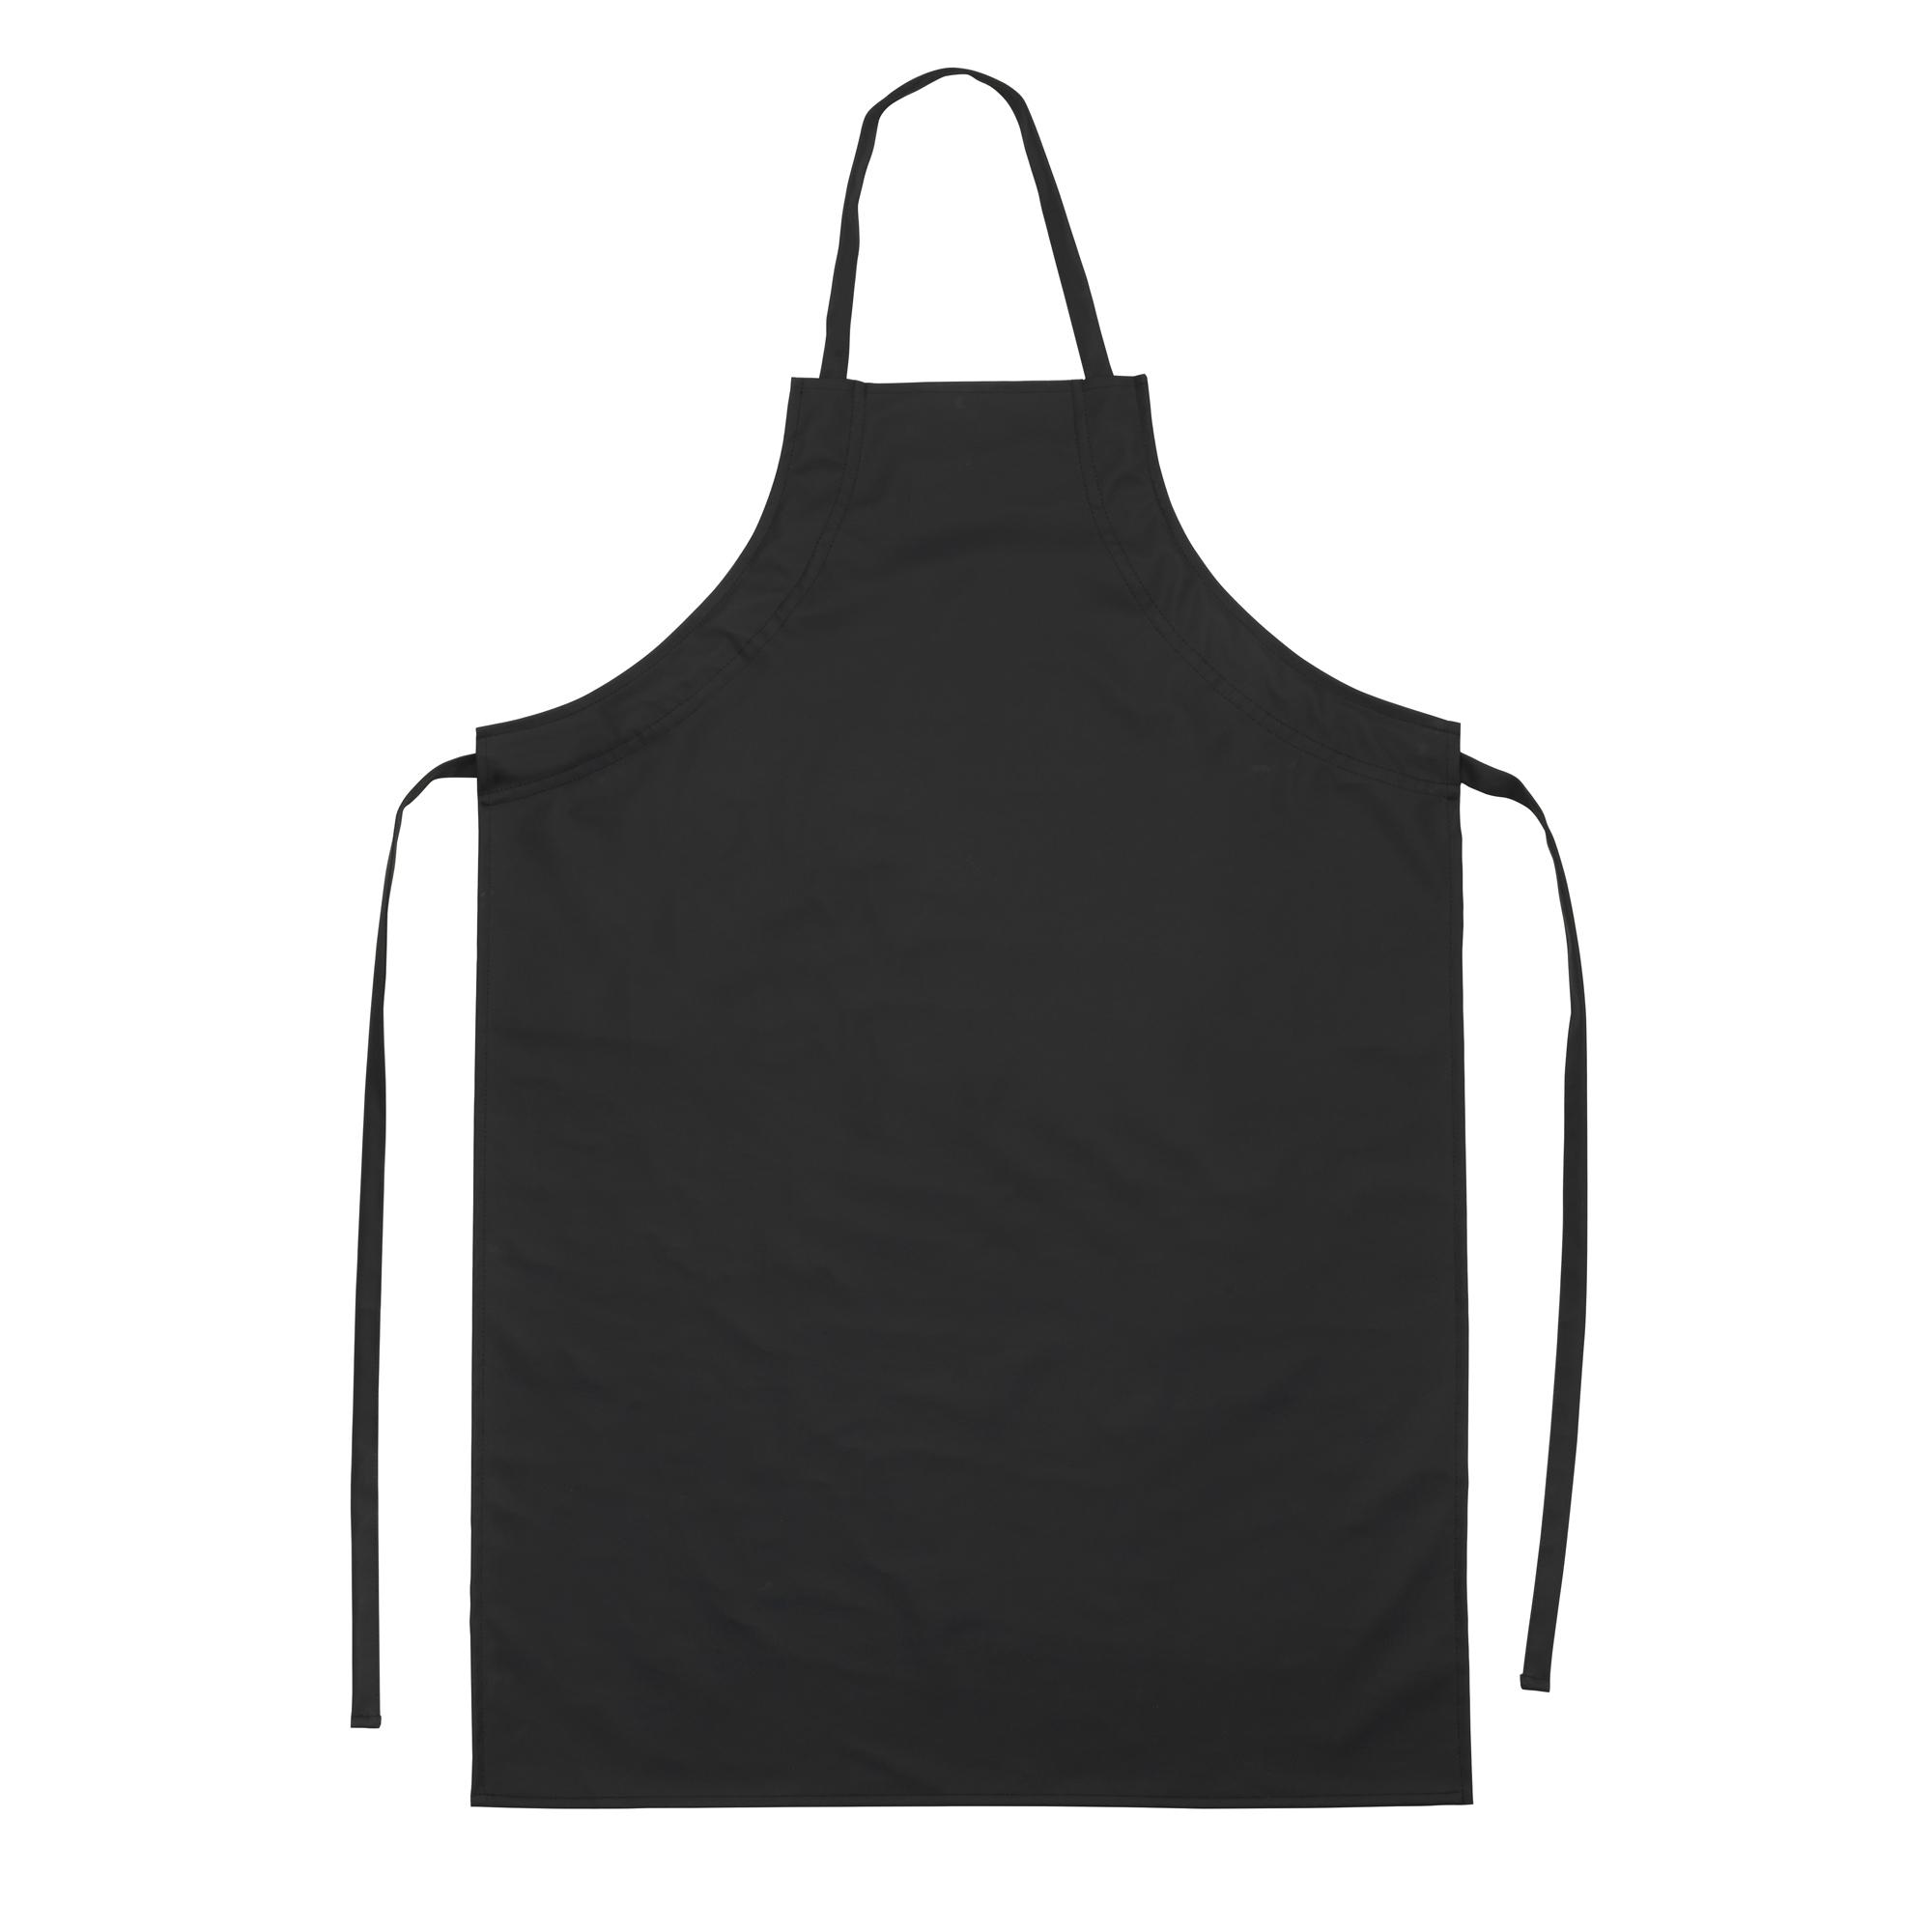 Winco BAW-2540BK dishwashing apron